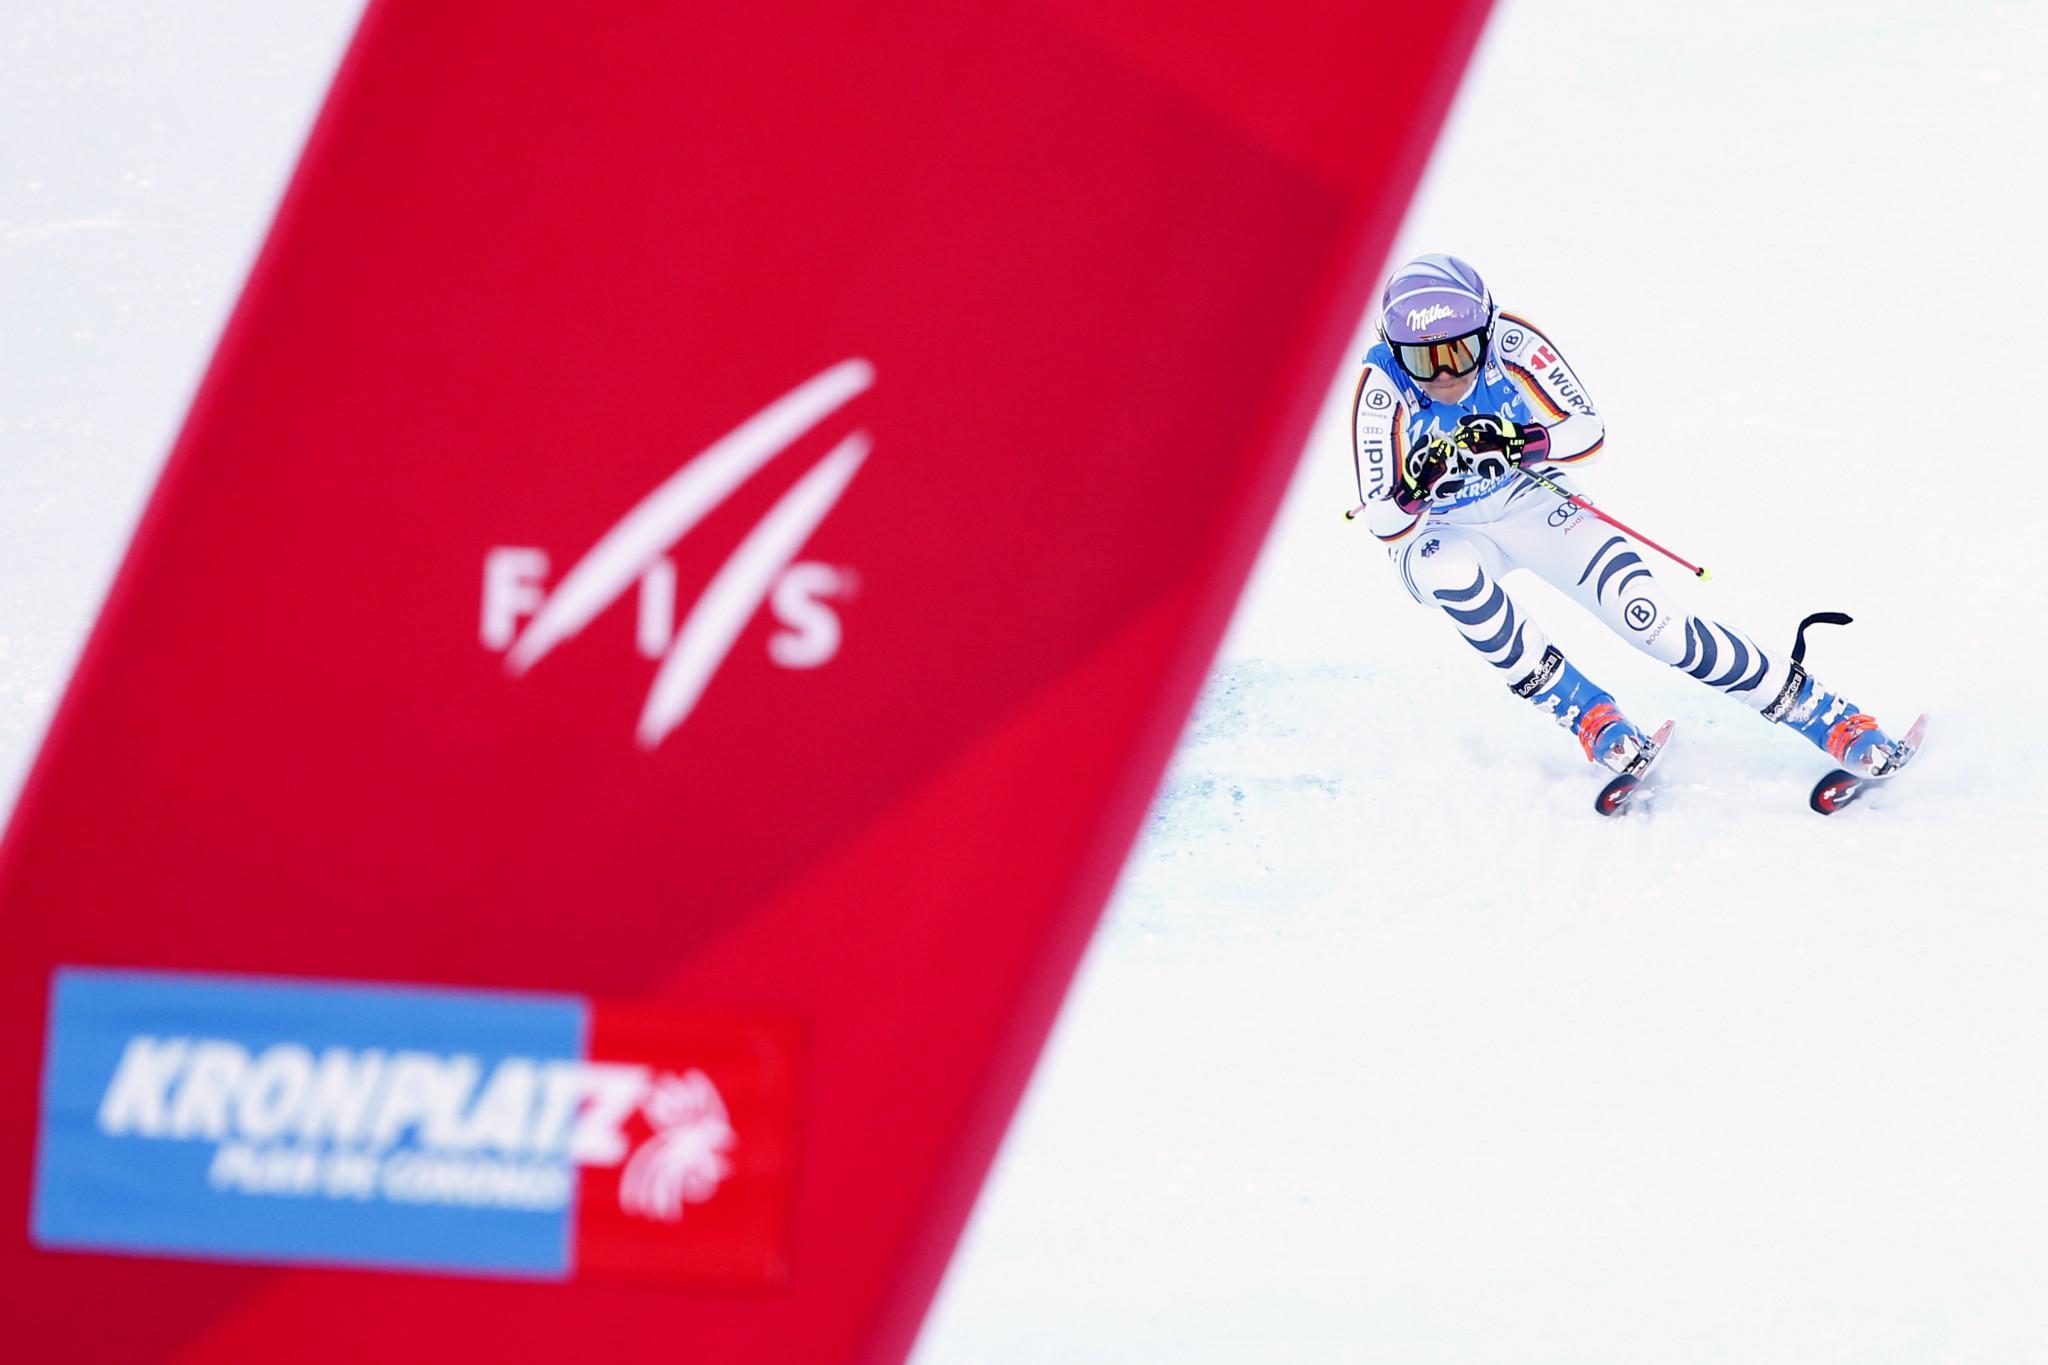 Viktoria Rebensburg clinched victory today in Kronplatz ©Getty Images